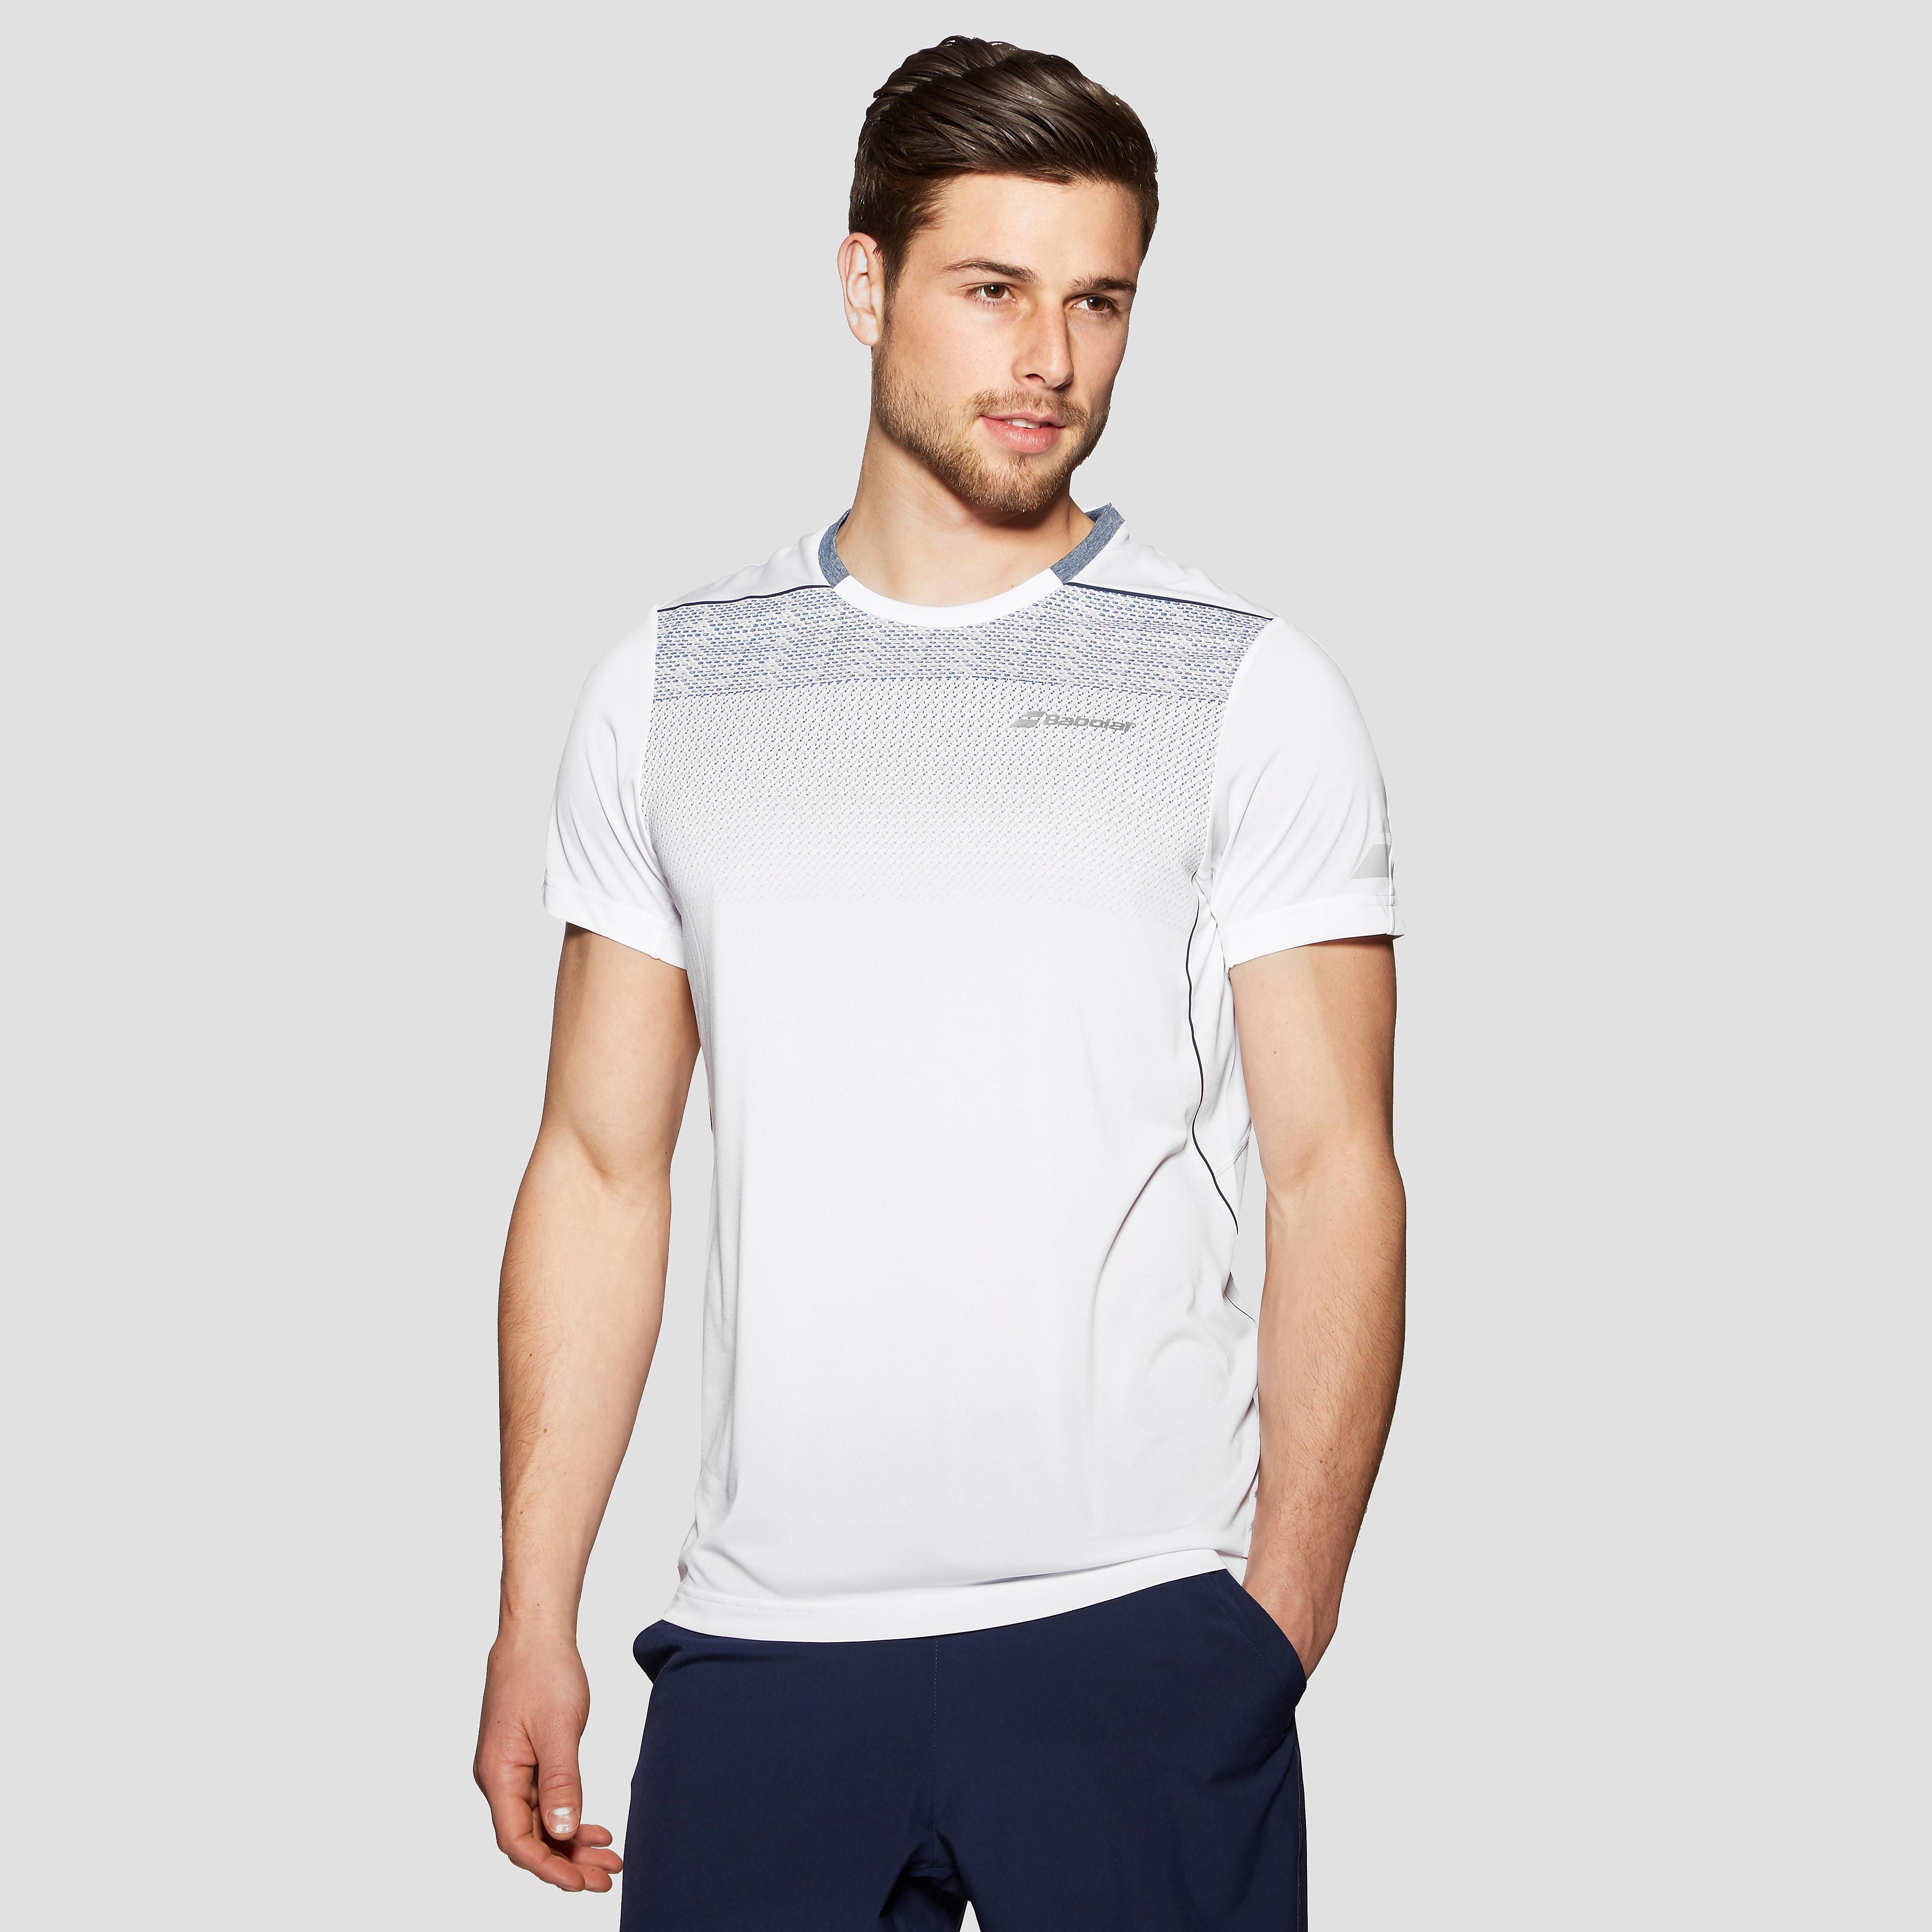 Babolat Performance Crew Neck Men's Tennis T-shirt